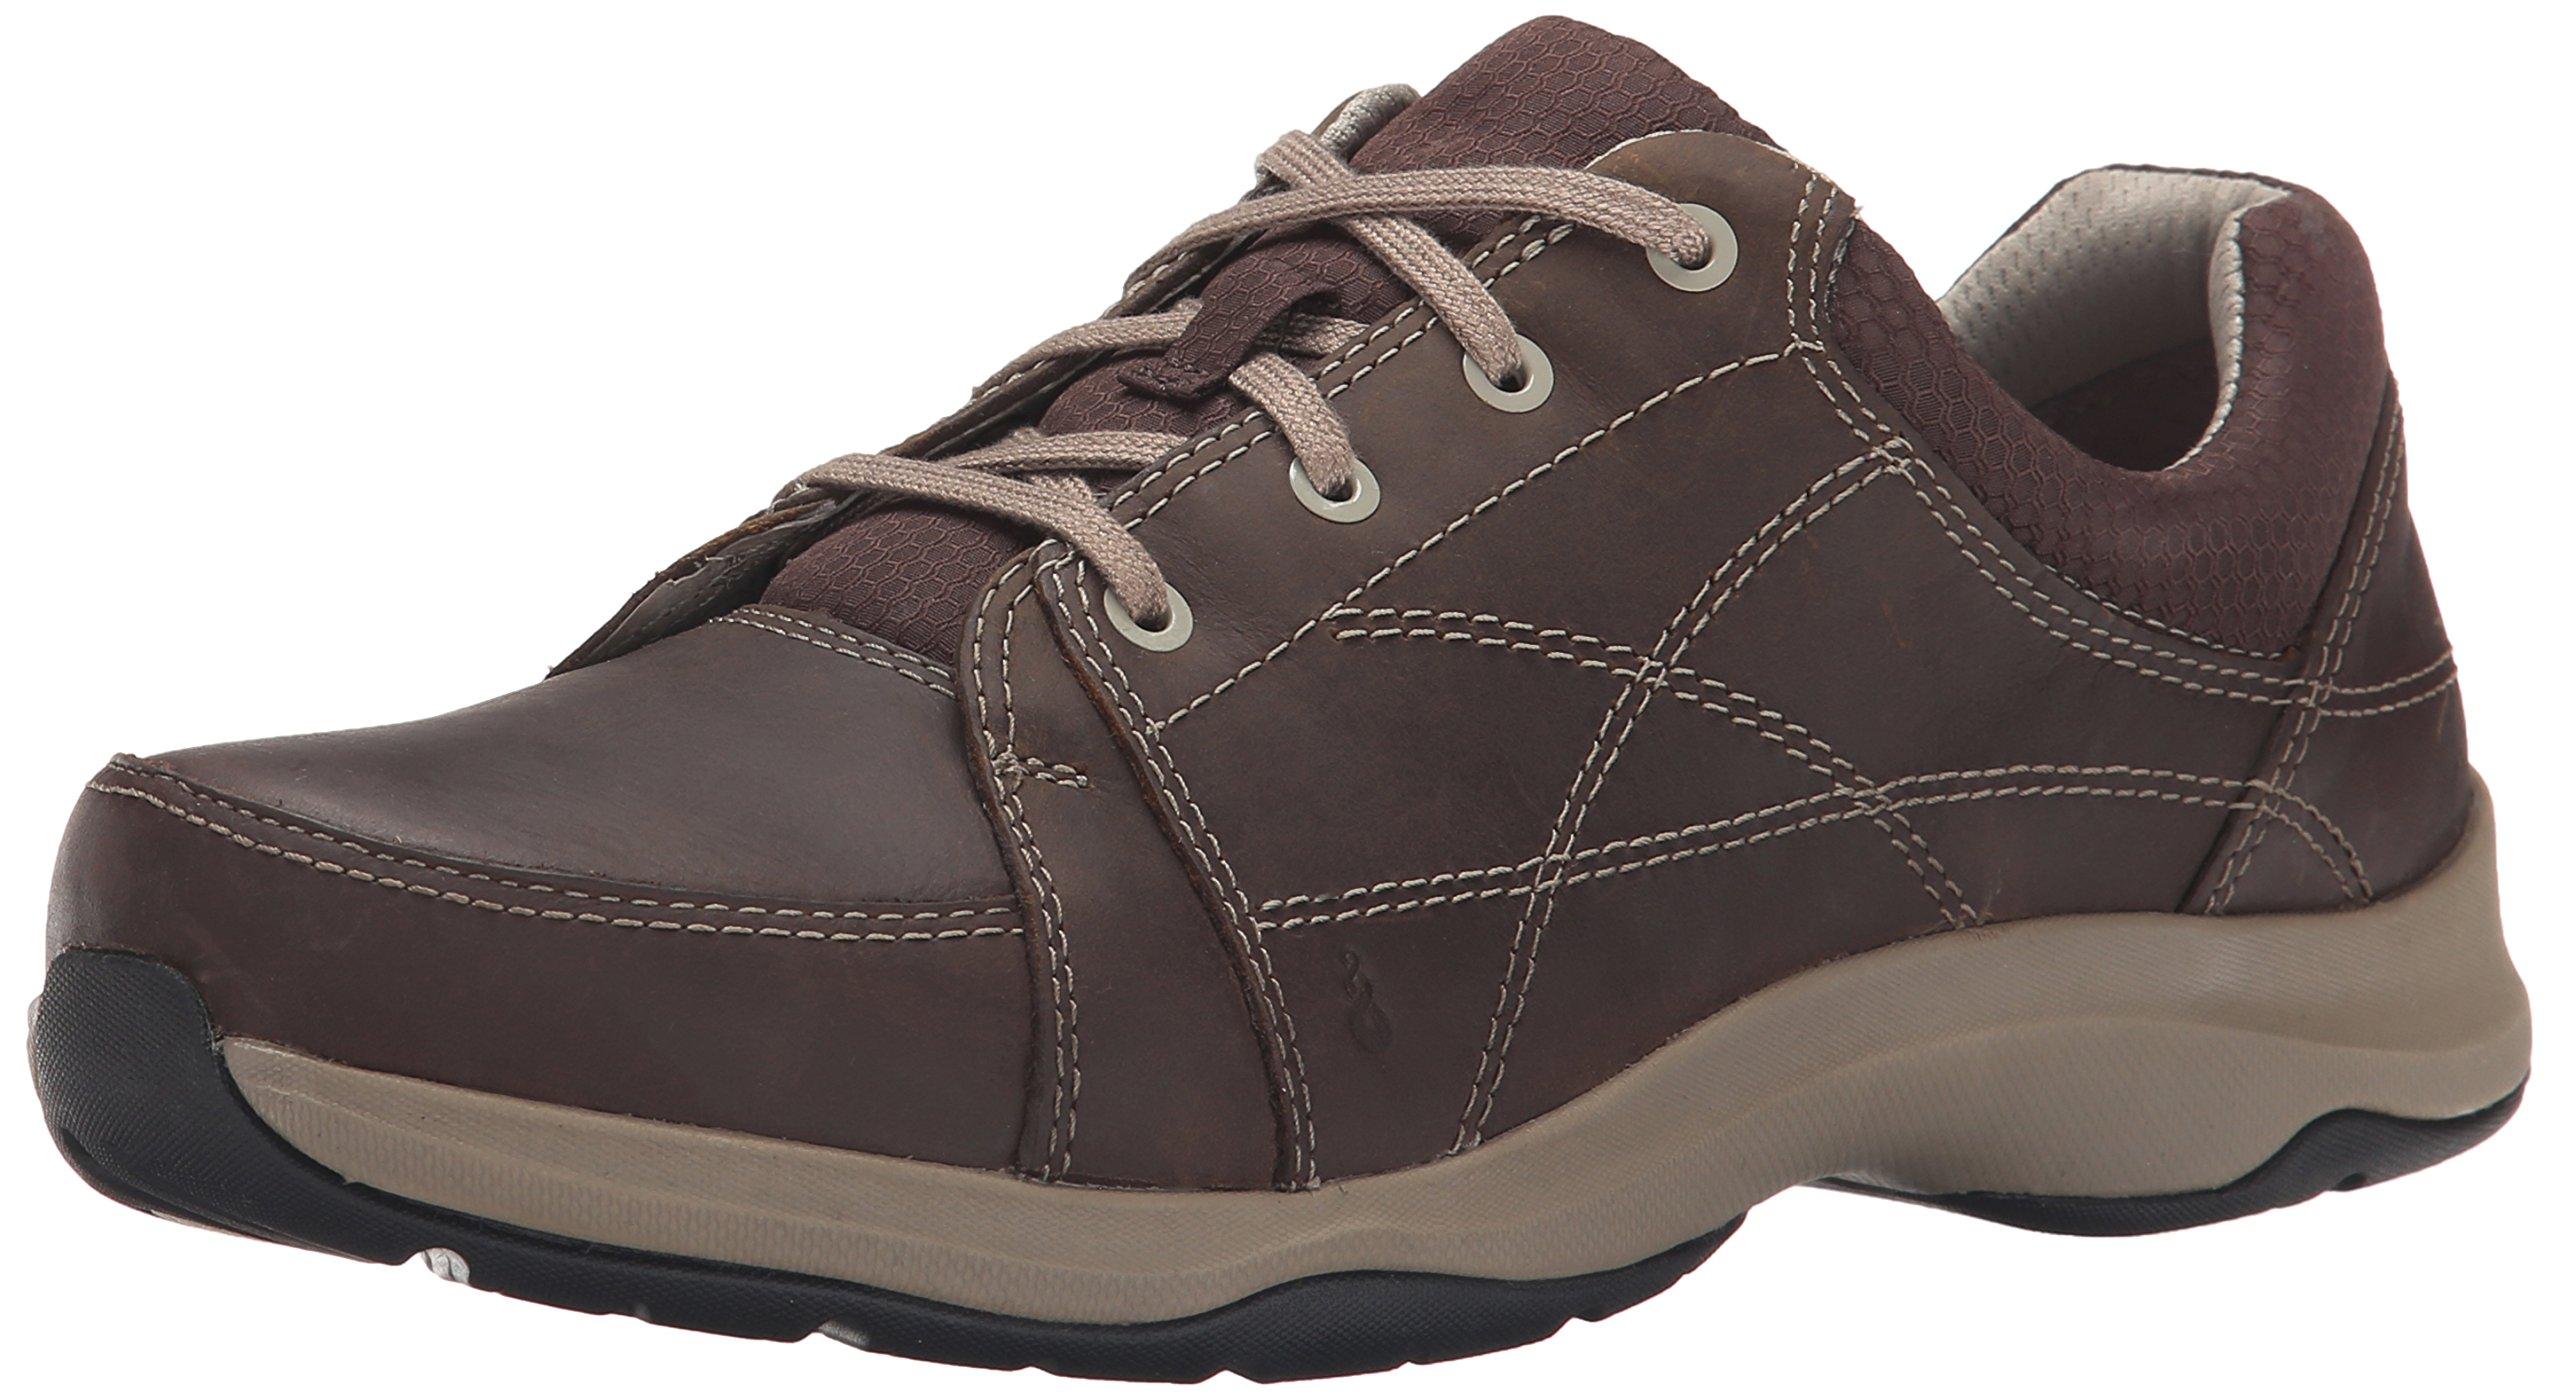 Ahnu Women's Taraval Walking Shoe, Porter, 8 M US